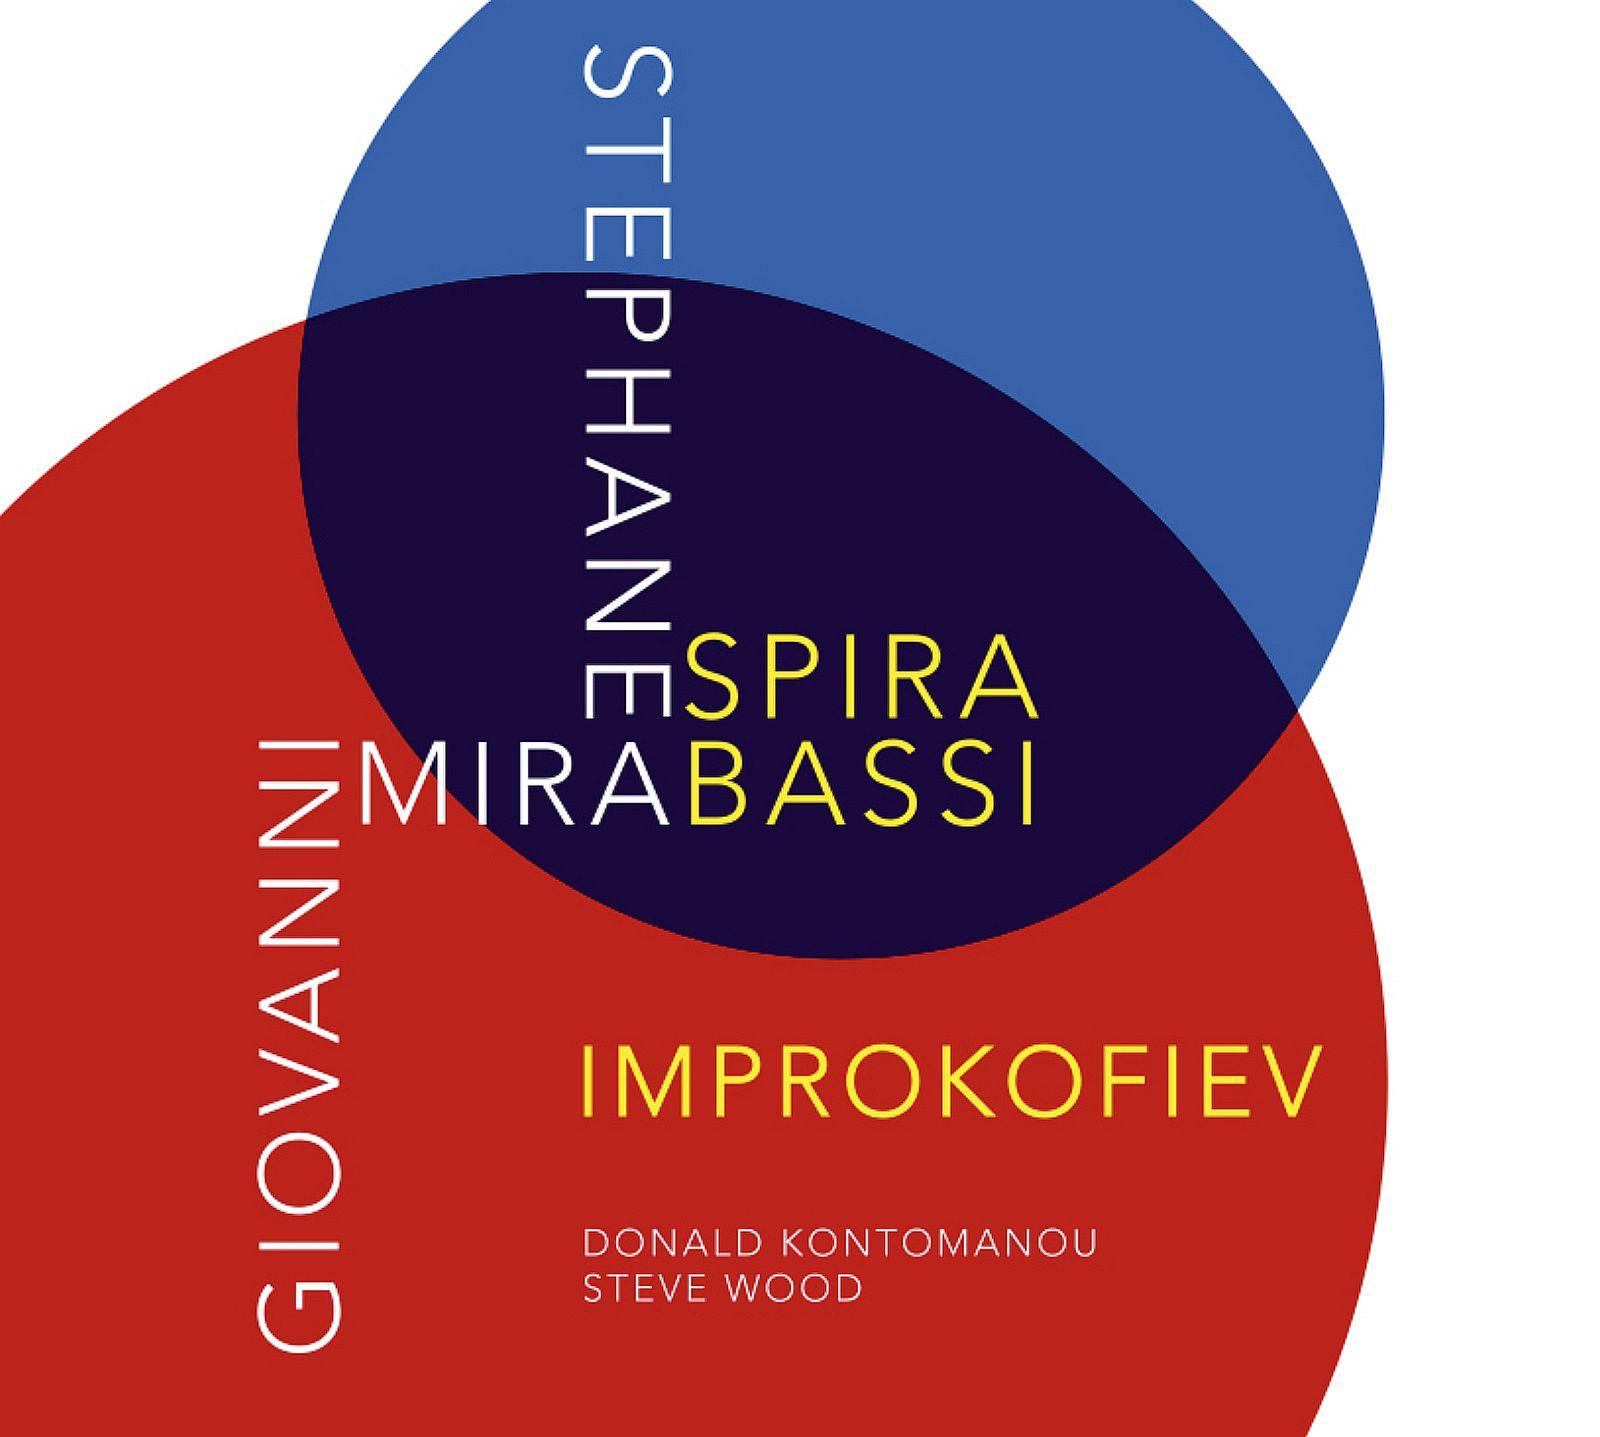 Spira_Cover_Improkofiev_Album